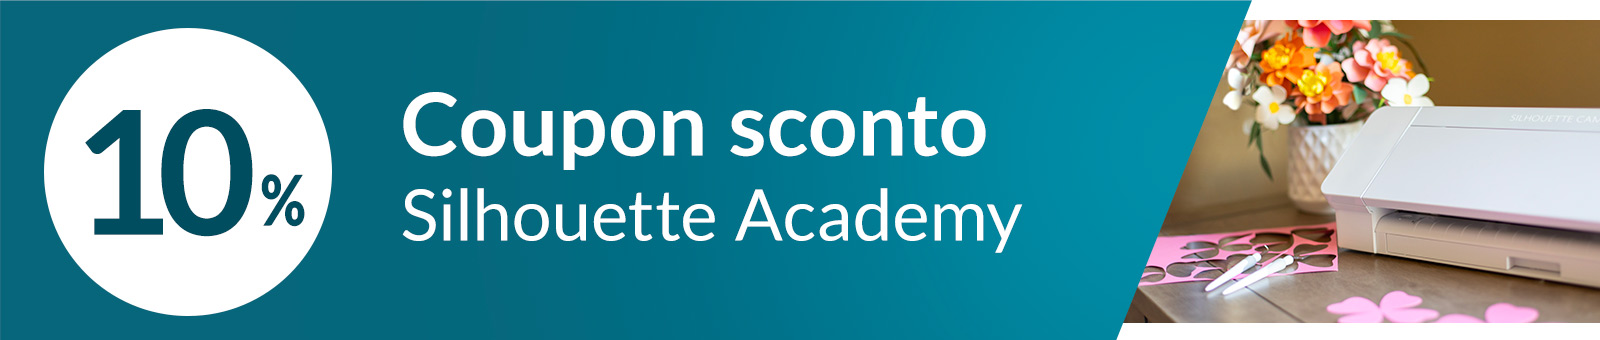 Sconto-webinar-corso-materiali-Silhouette-Academy